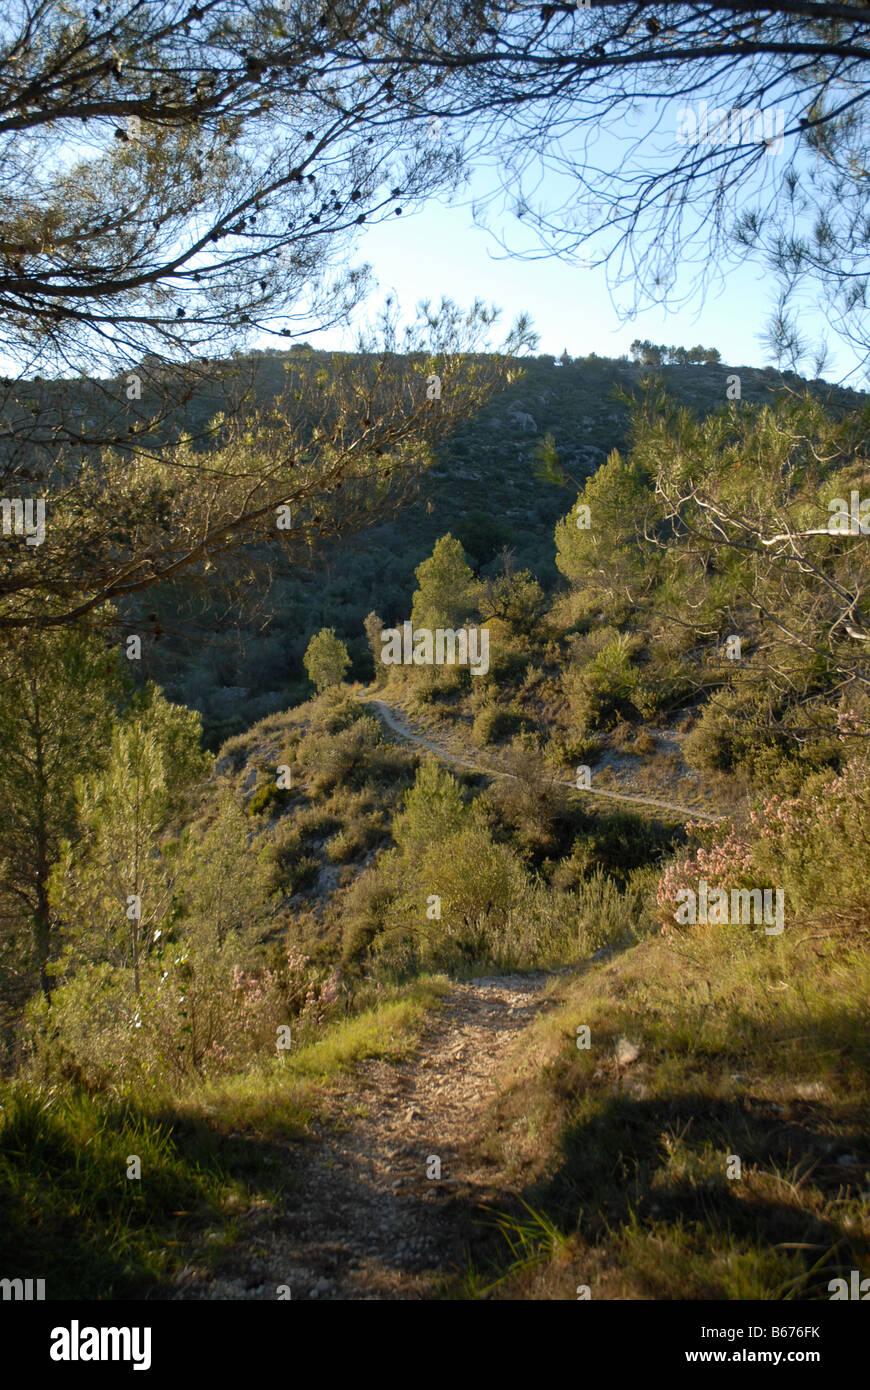 track to Els Tolls, near Vall de Ebo village, Marina Alta, Alicante Prov. Comunidad Valenciana, Spain - Stock Image